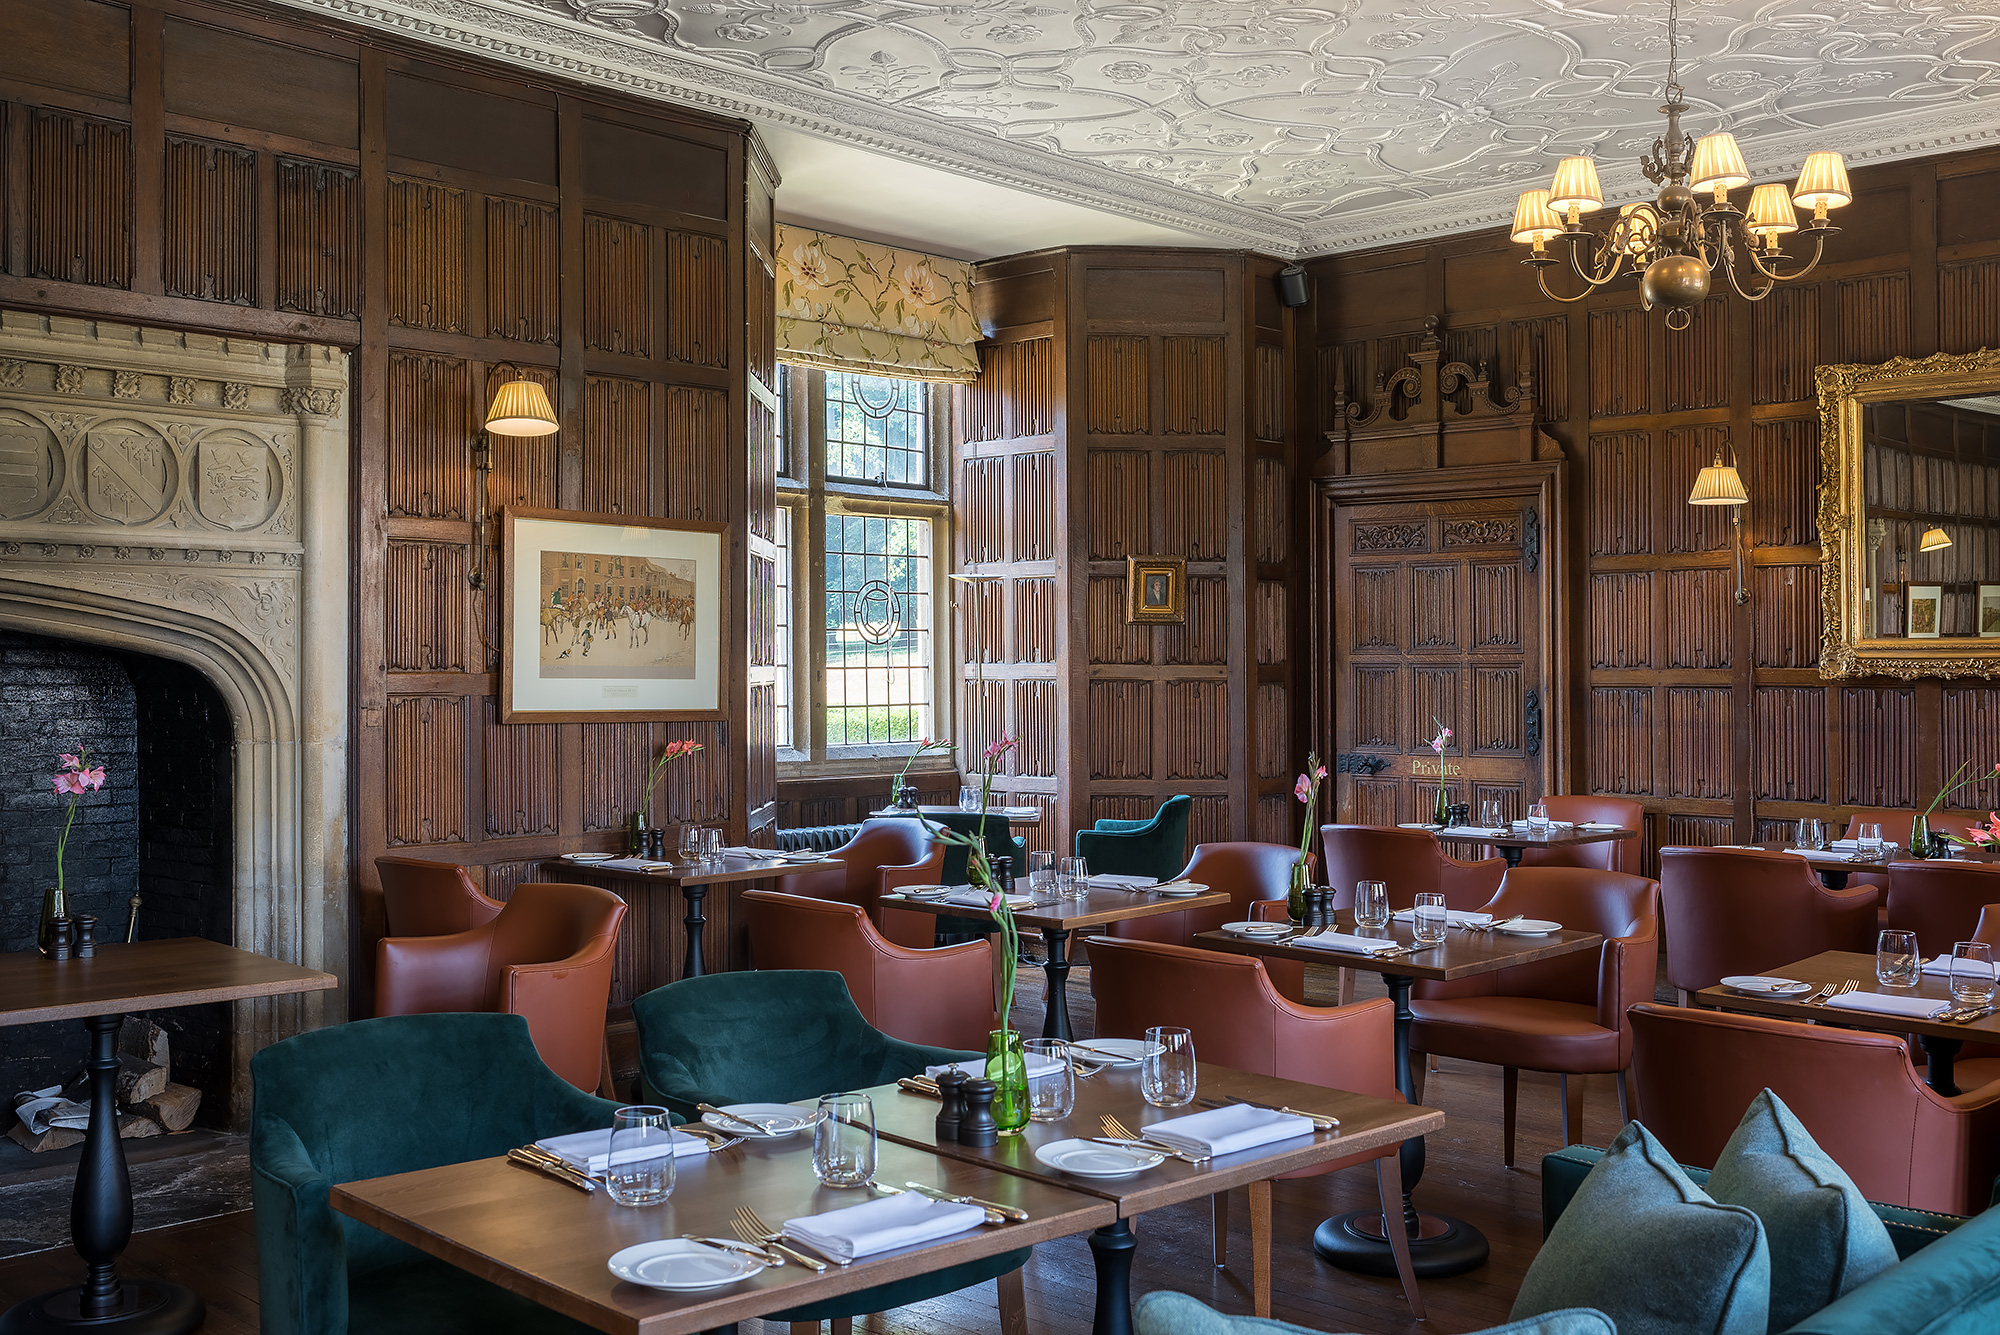 hotel-brasserie-table-photography.jpg